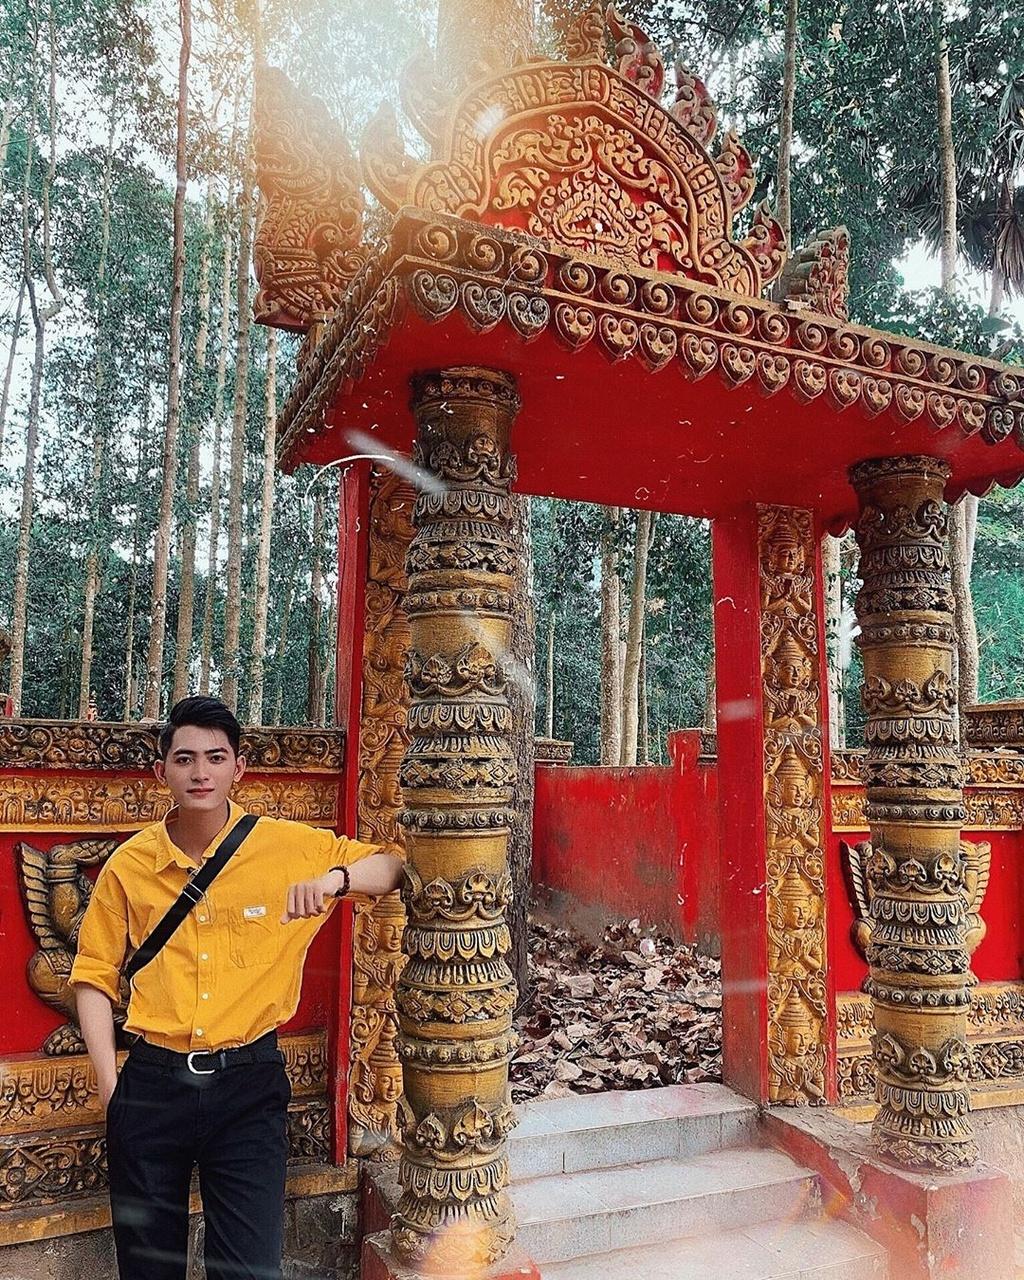 Hai loc dau nam tai 5 ngoi chua co kien truc doc dao o Soc Trang hinh anh 9 doi_chiithanh.jpg